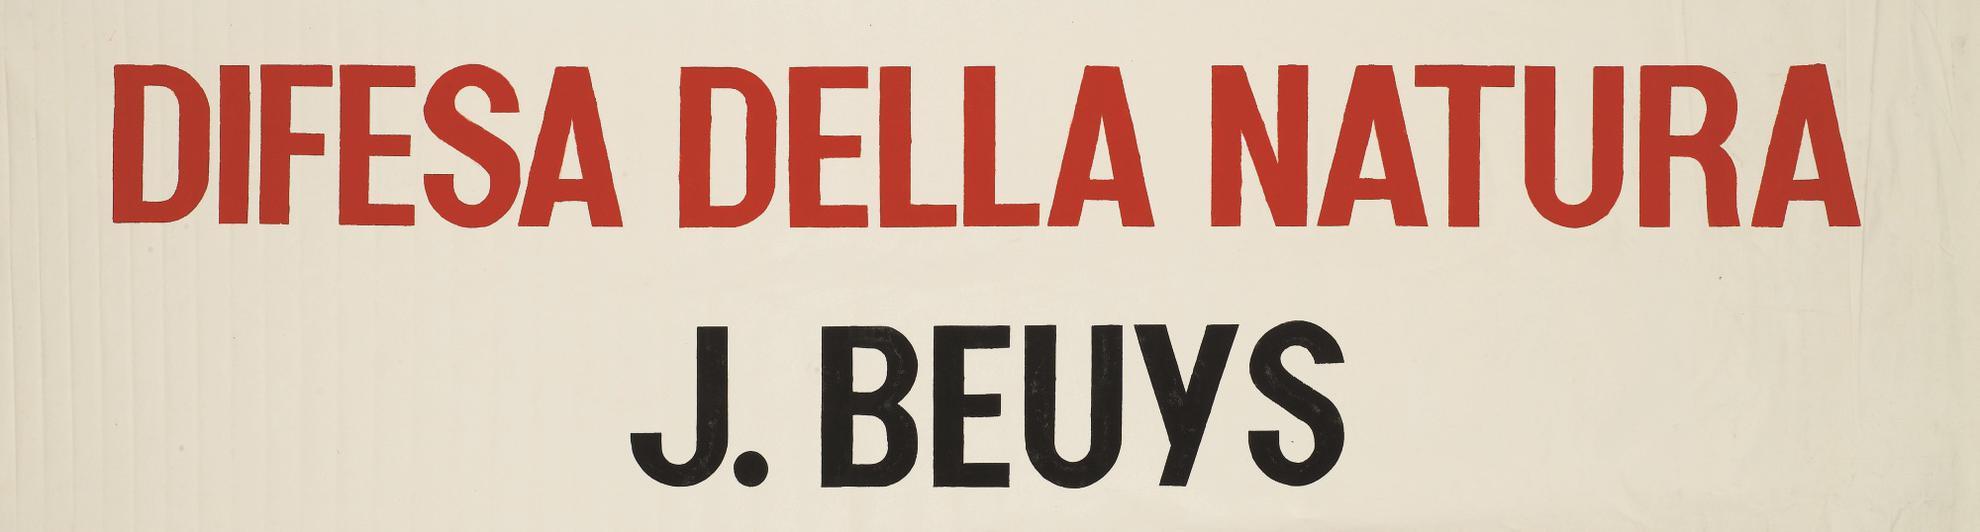 Joseph Beuys-Difesa Della Natura-1982